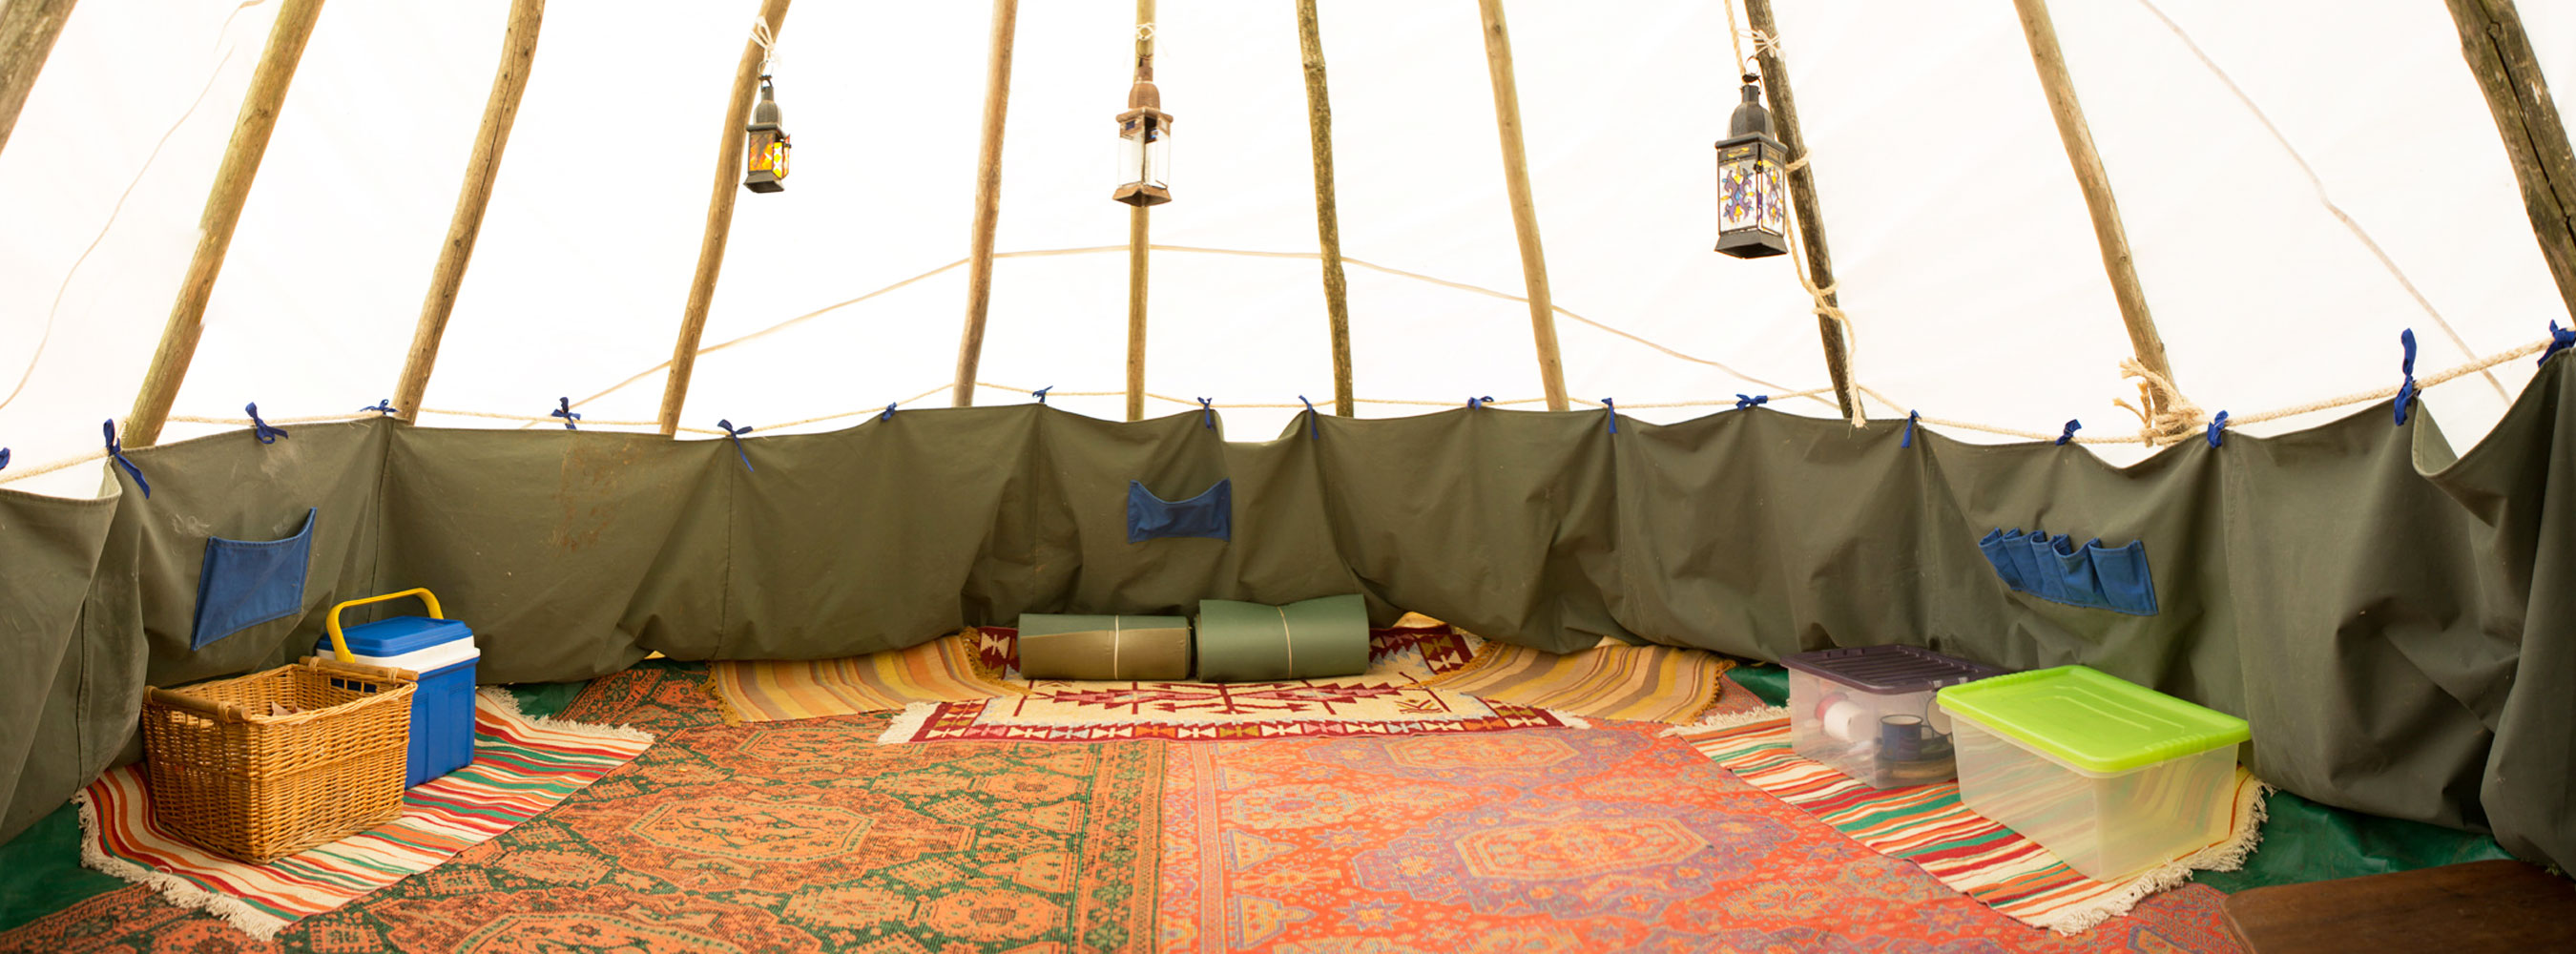 Tipi interior rugs, lanterns, cooking equipment, bedrolls